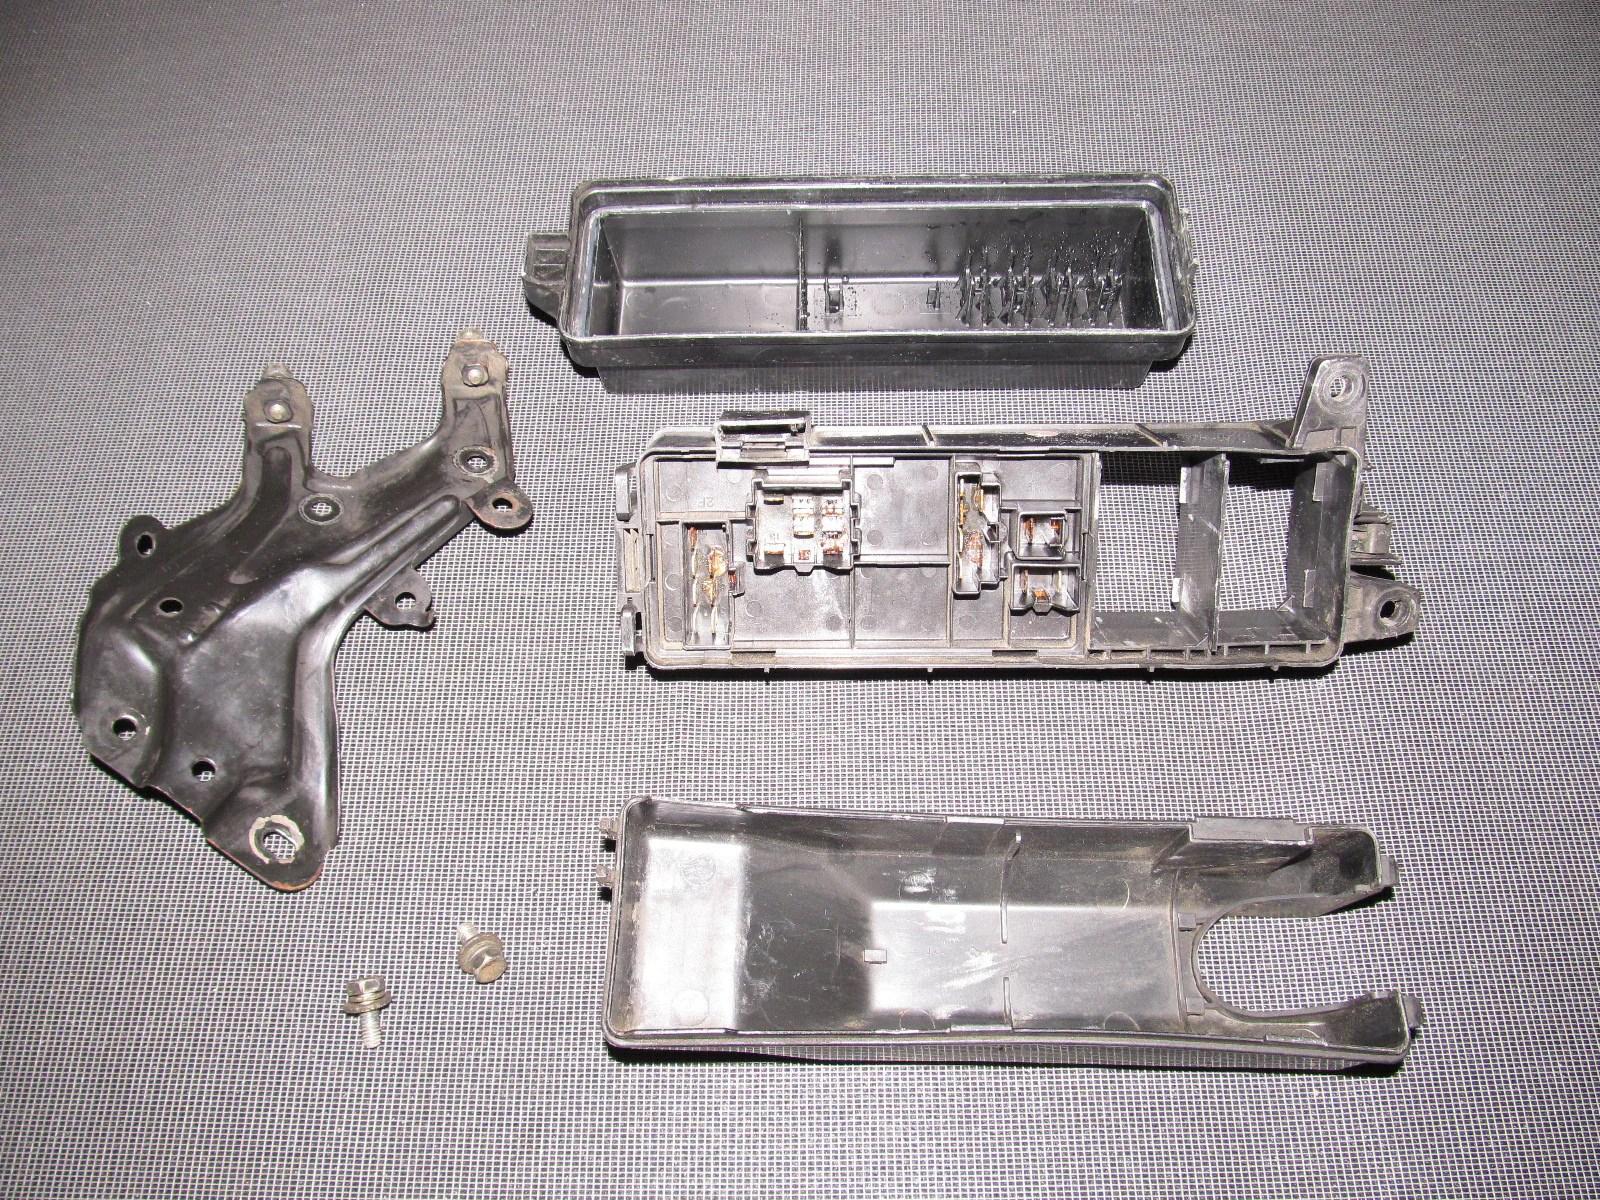 hight resolution of 89 90 91 92 toyota supra oem engine fuse box autopartone com 1987 toyota supra fuse